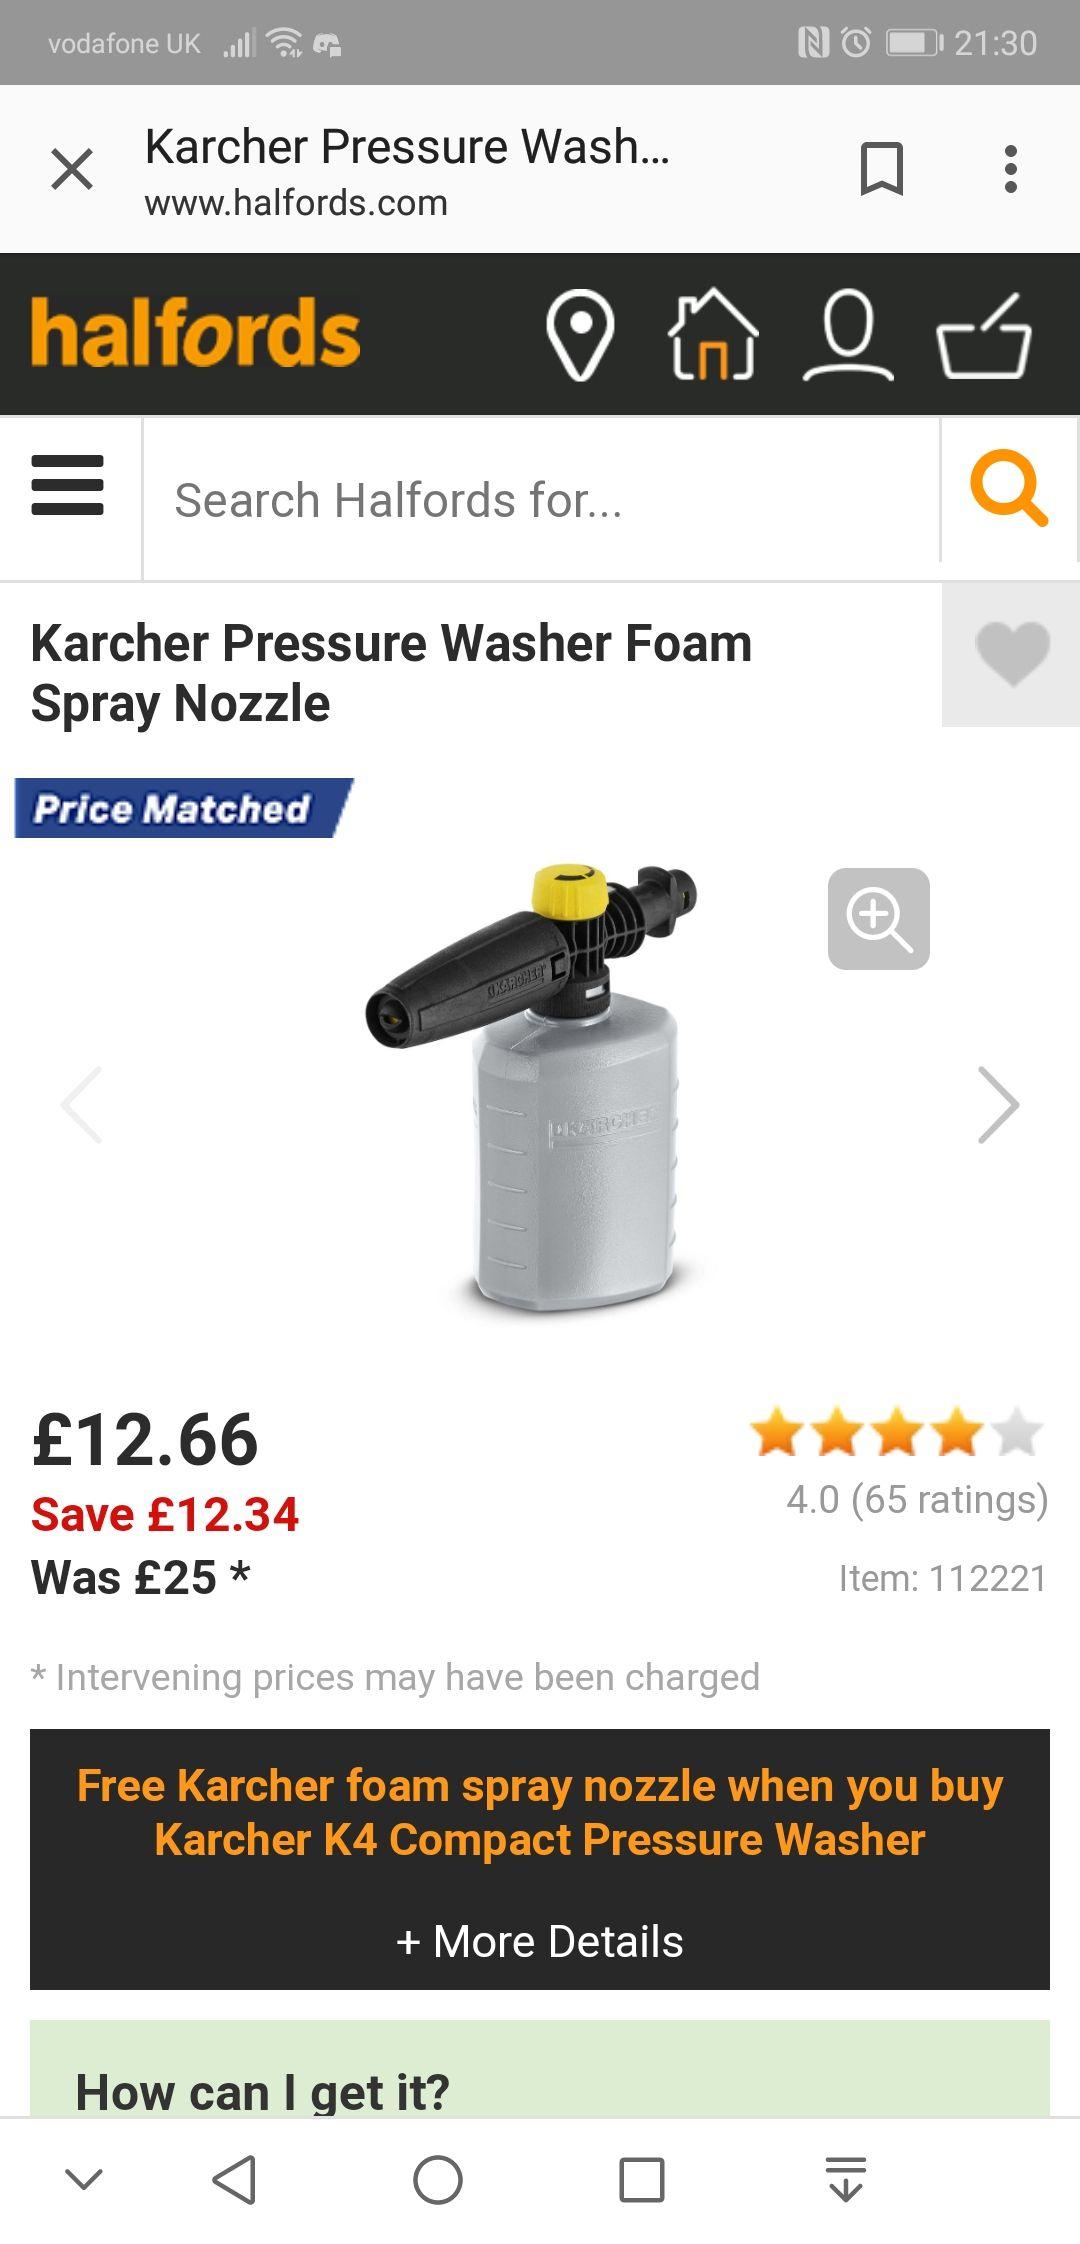 Karcher Pressure Washer Foam Spray Nozzle at Halfords for £12.66